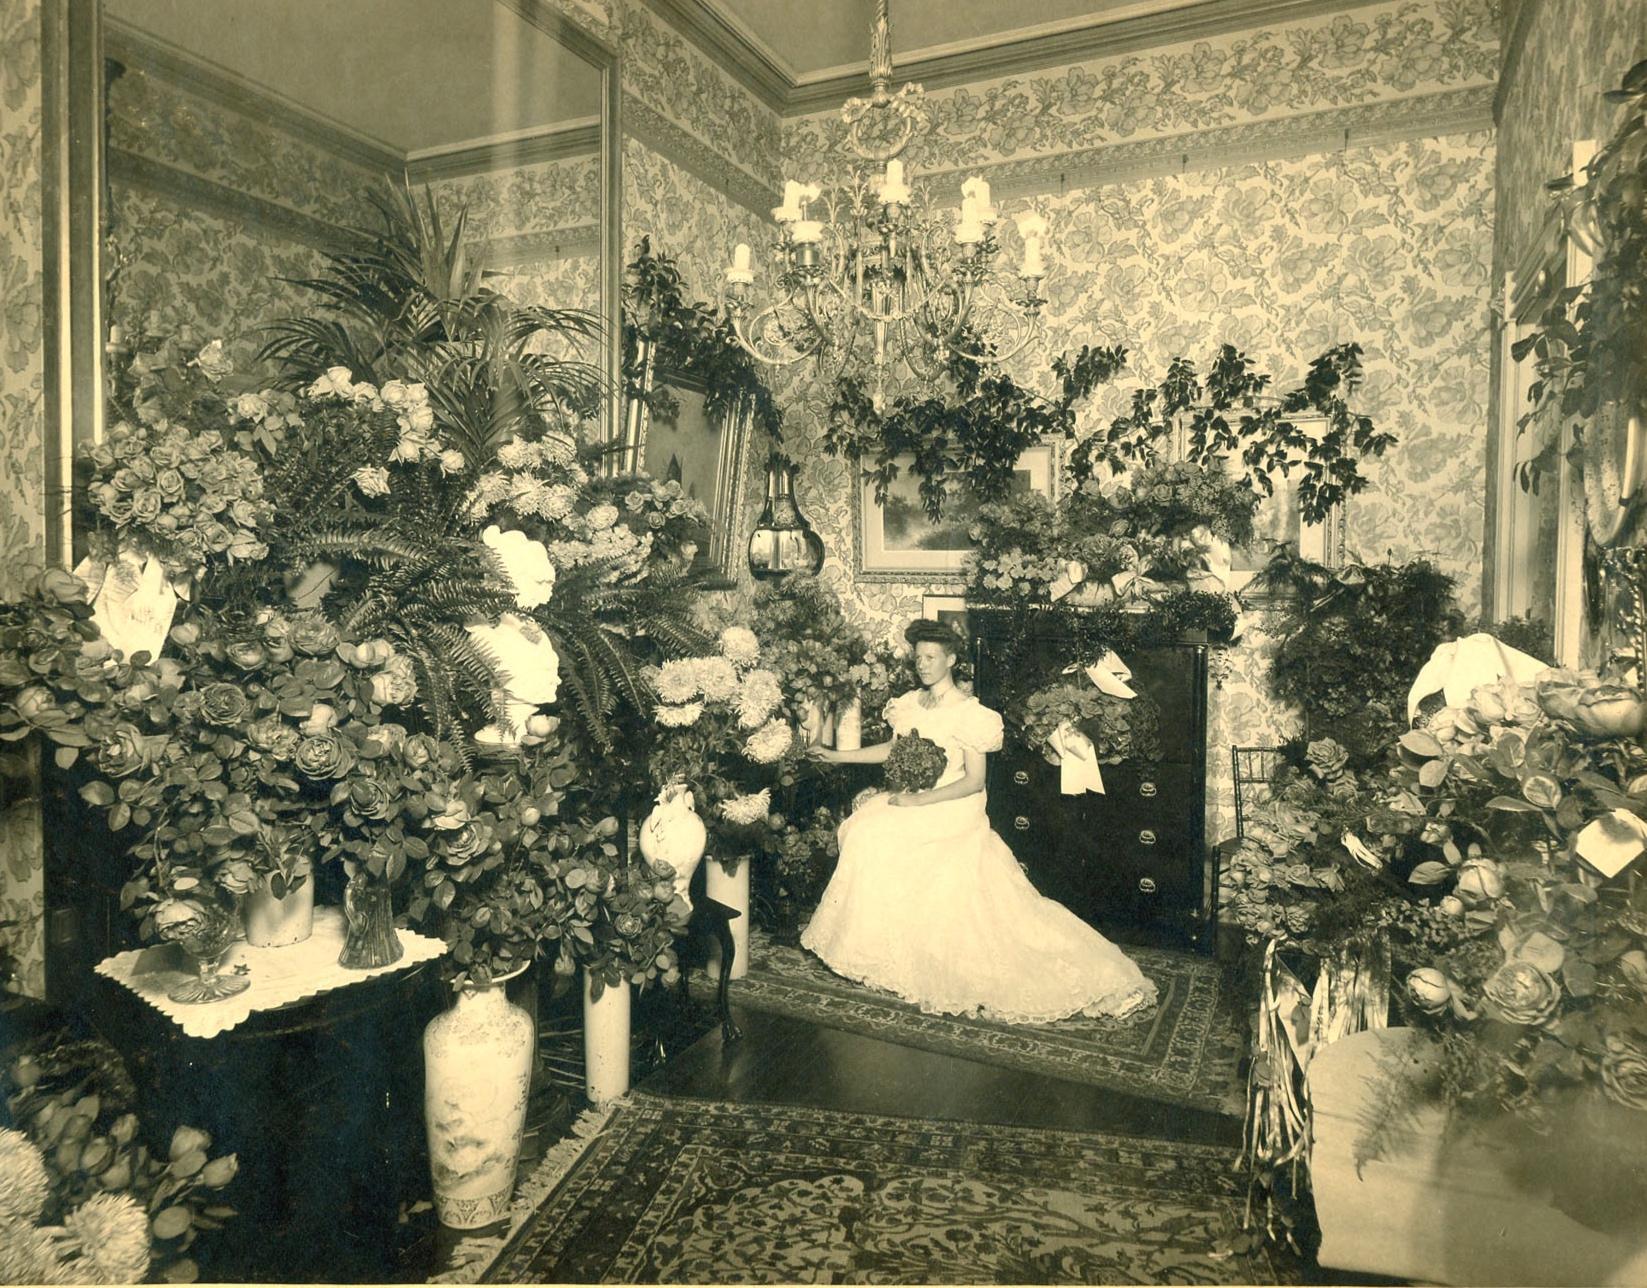 George+Amanda+Cluett+1904+Beatrice+w+flowers.jpg